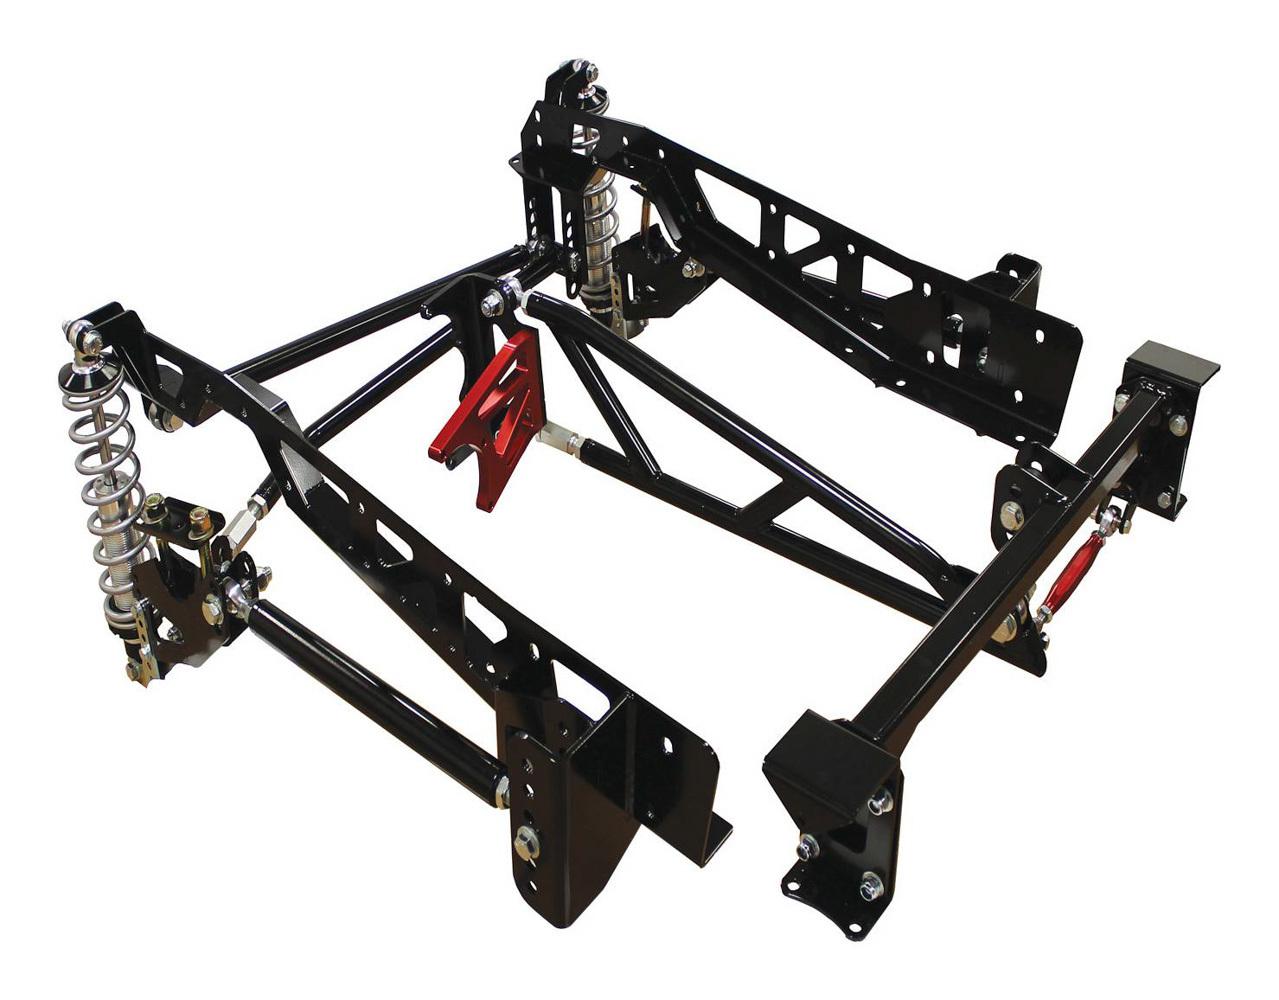 Qa1 Rear Suspension F100 Double Adjustable 65-72